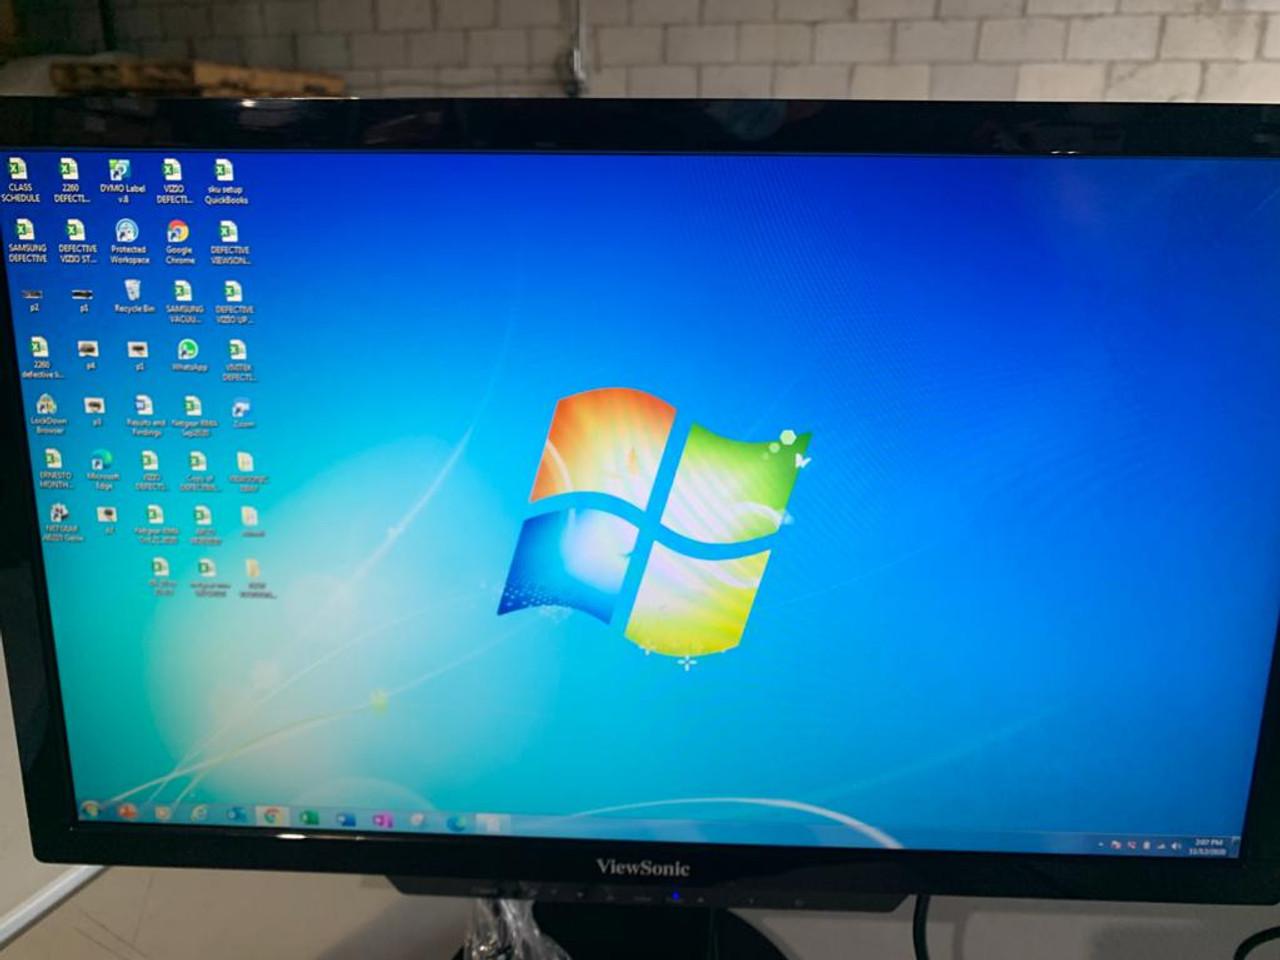 "ViewSonic DNI-SD-T225_BK_US0-R 22"" Screen LCD Thin Client Monitor - C Grade Refurbished"